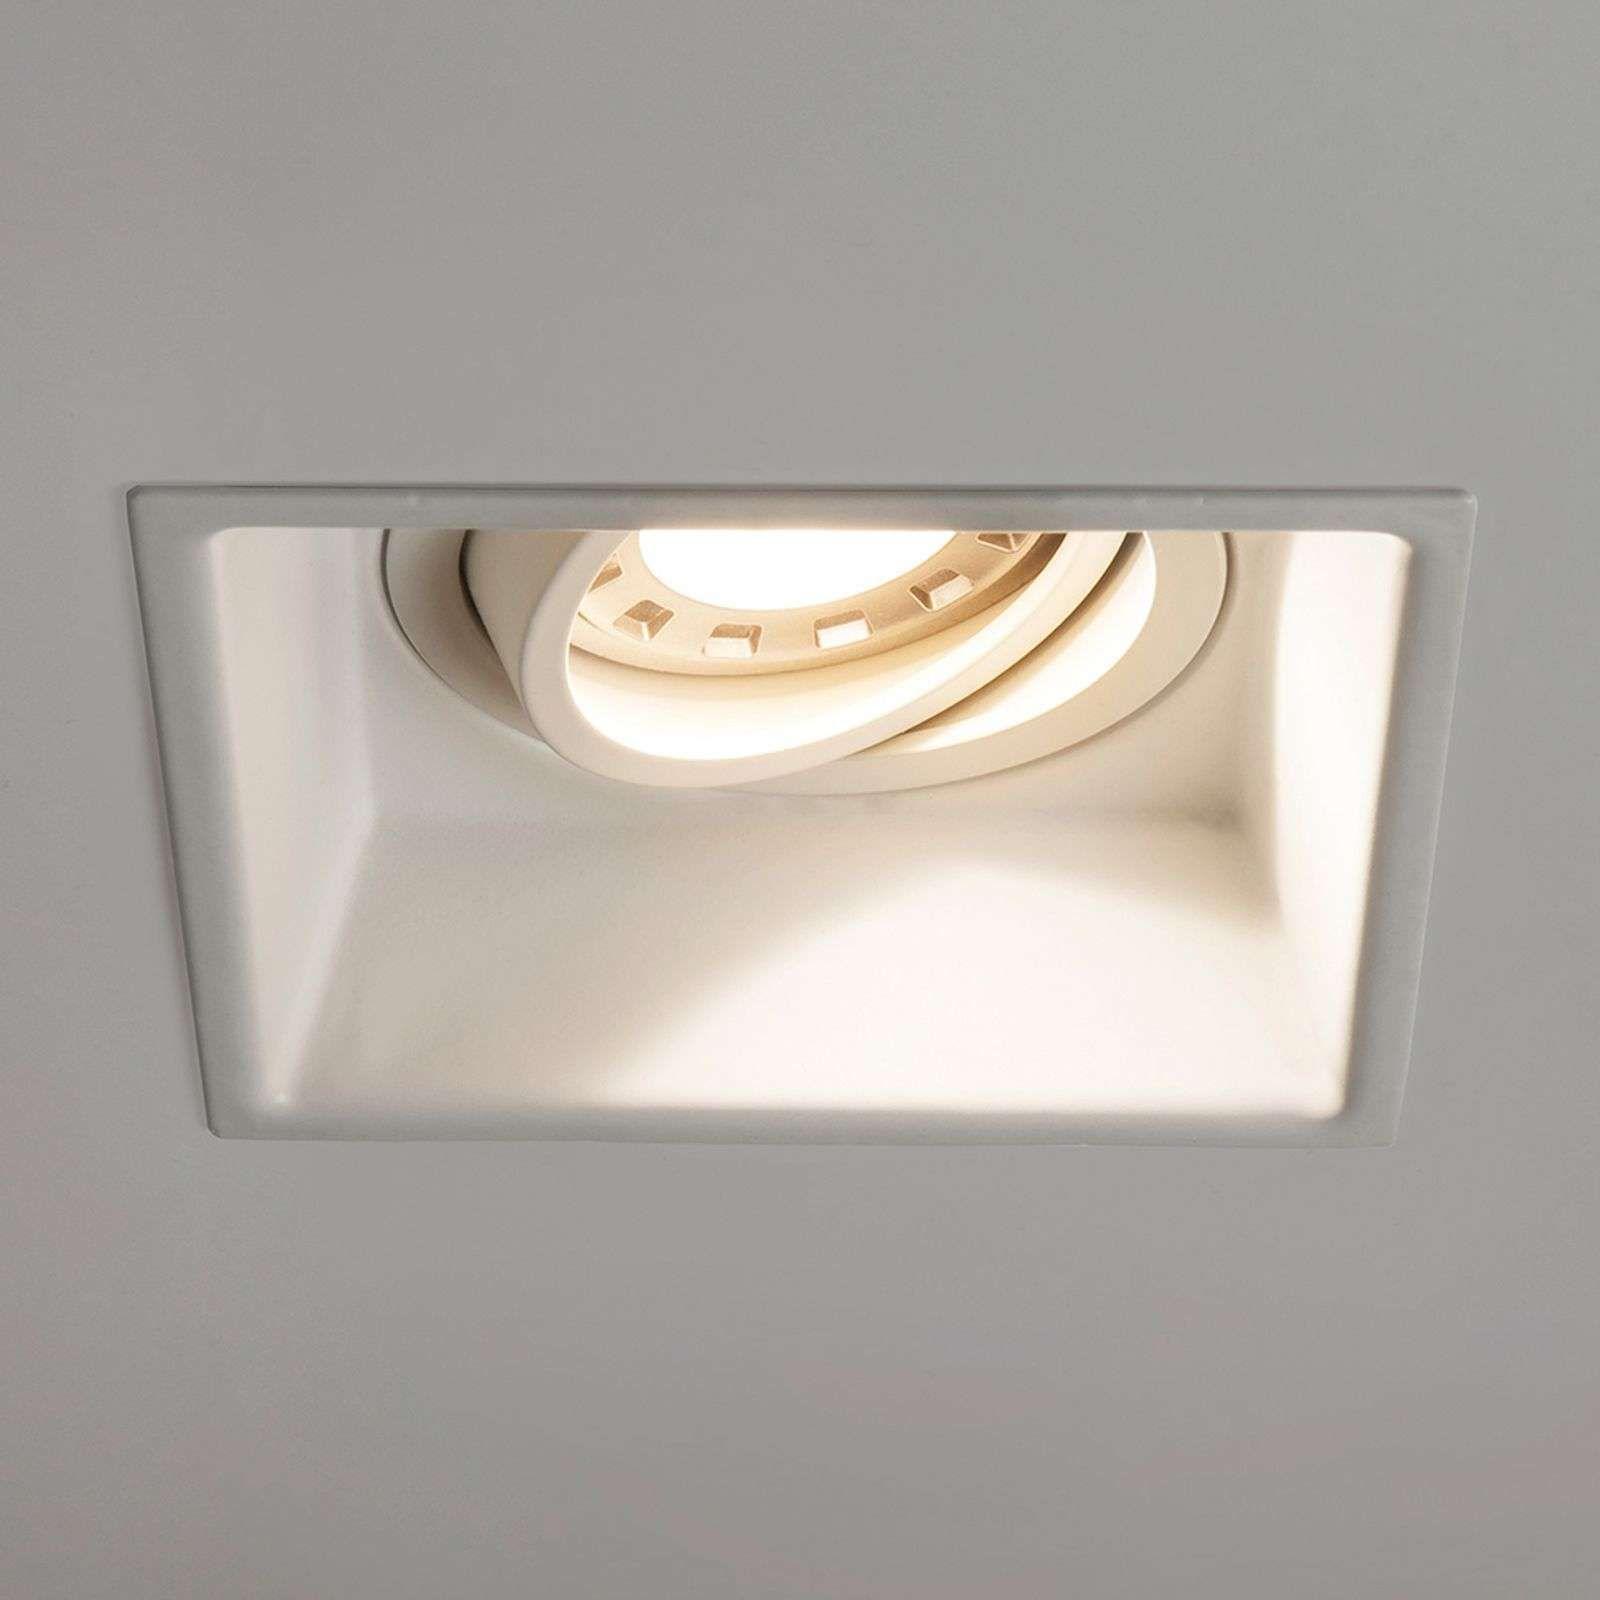 Astro Minima Square Adjustable Lampe Blanche Spot Encastrable Eclairage Moderne Lampe